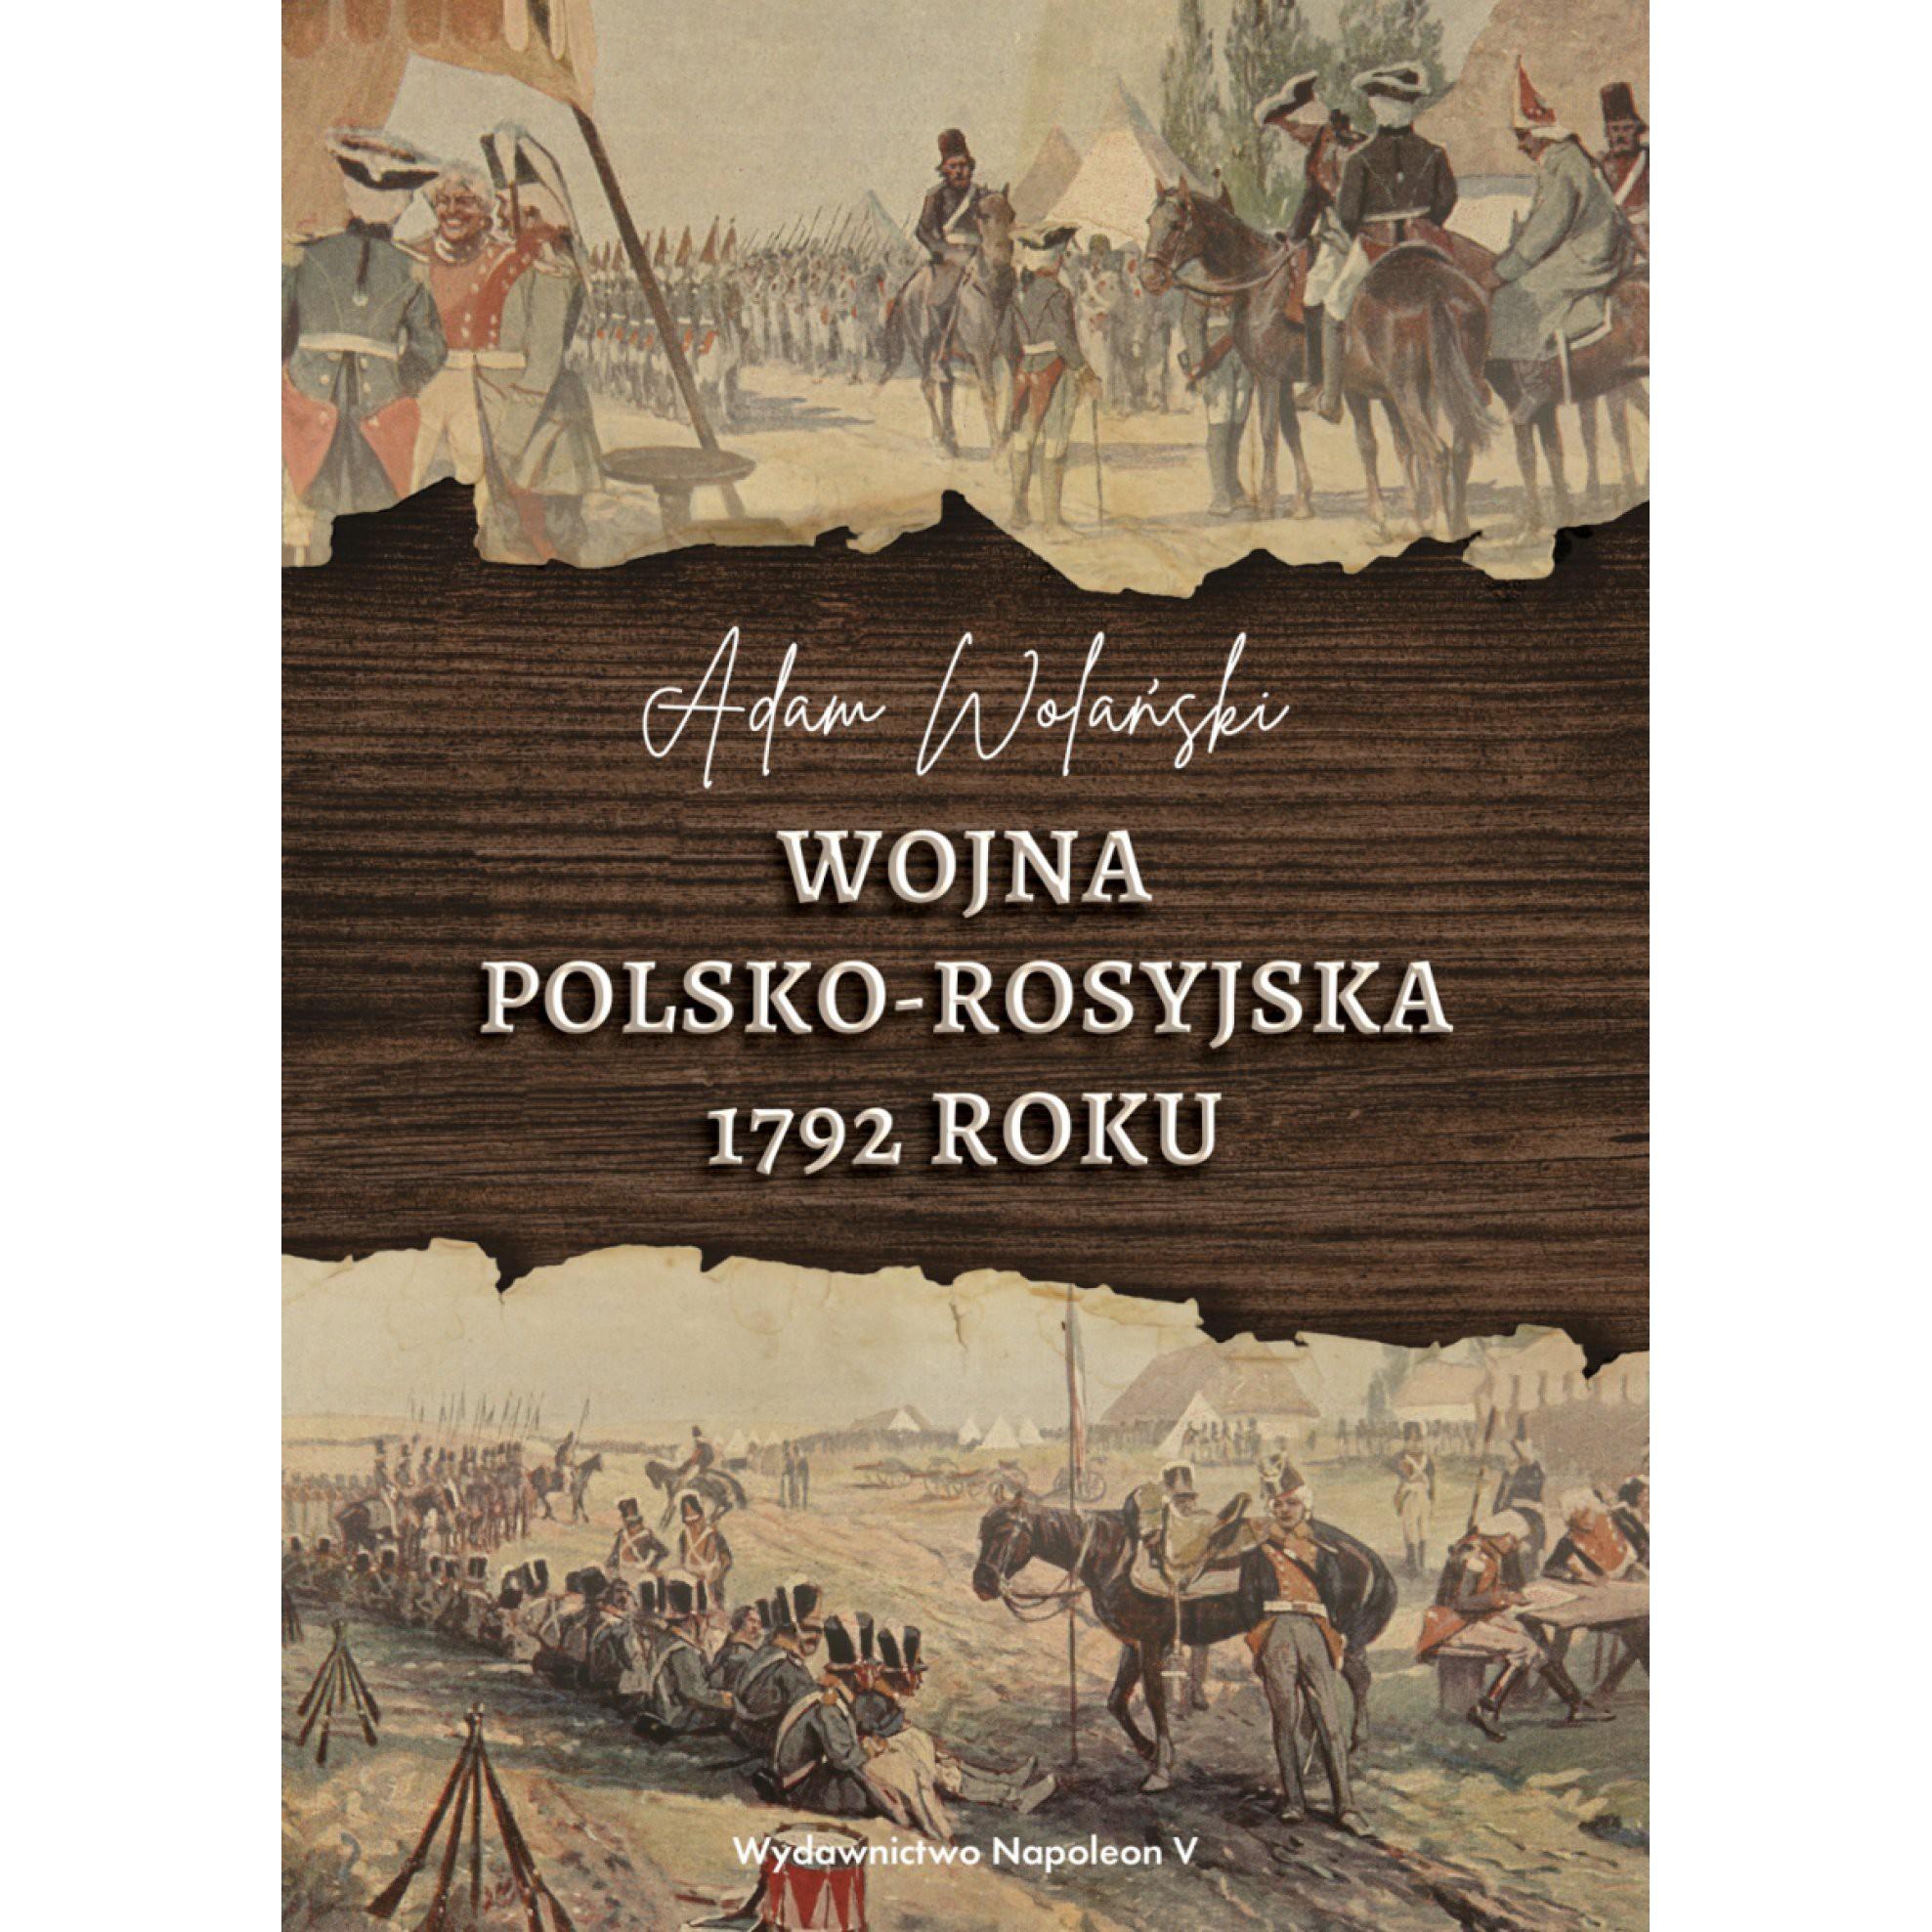 Wojna polsko-rosyjska 1792 roku